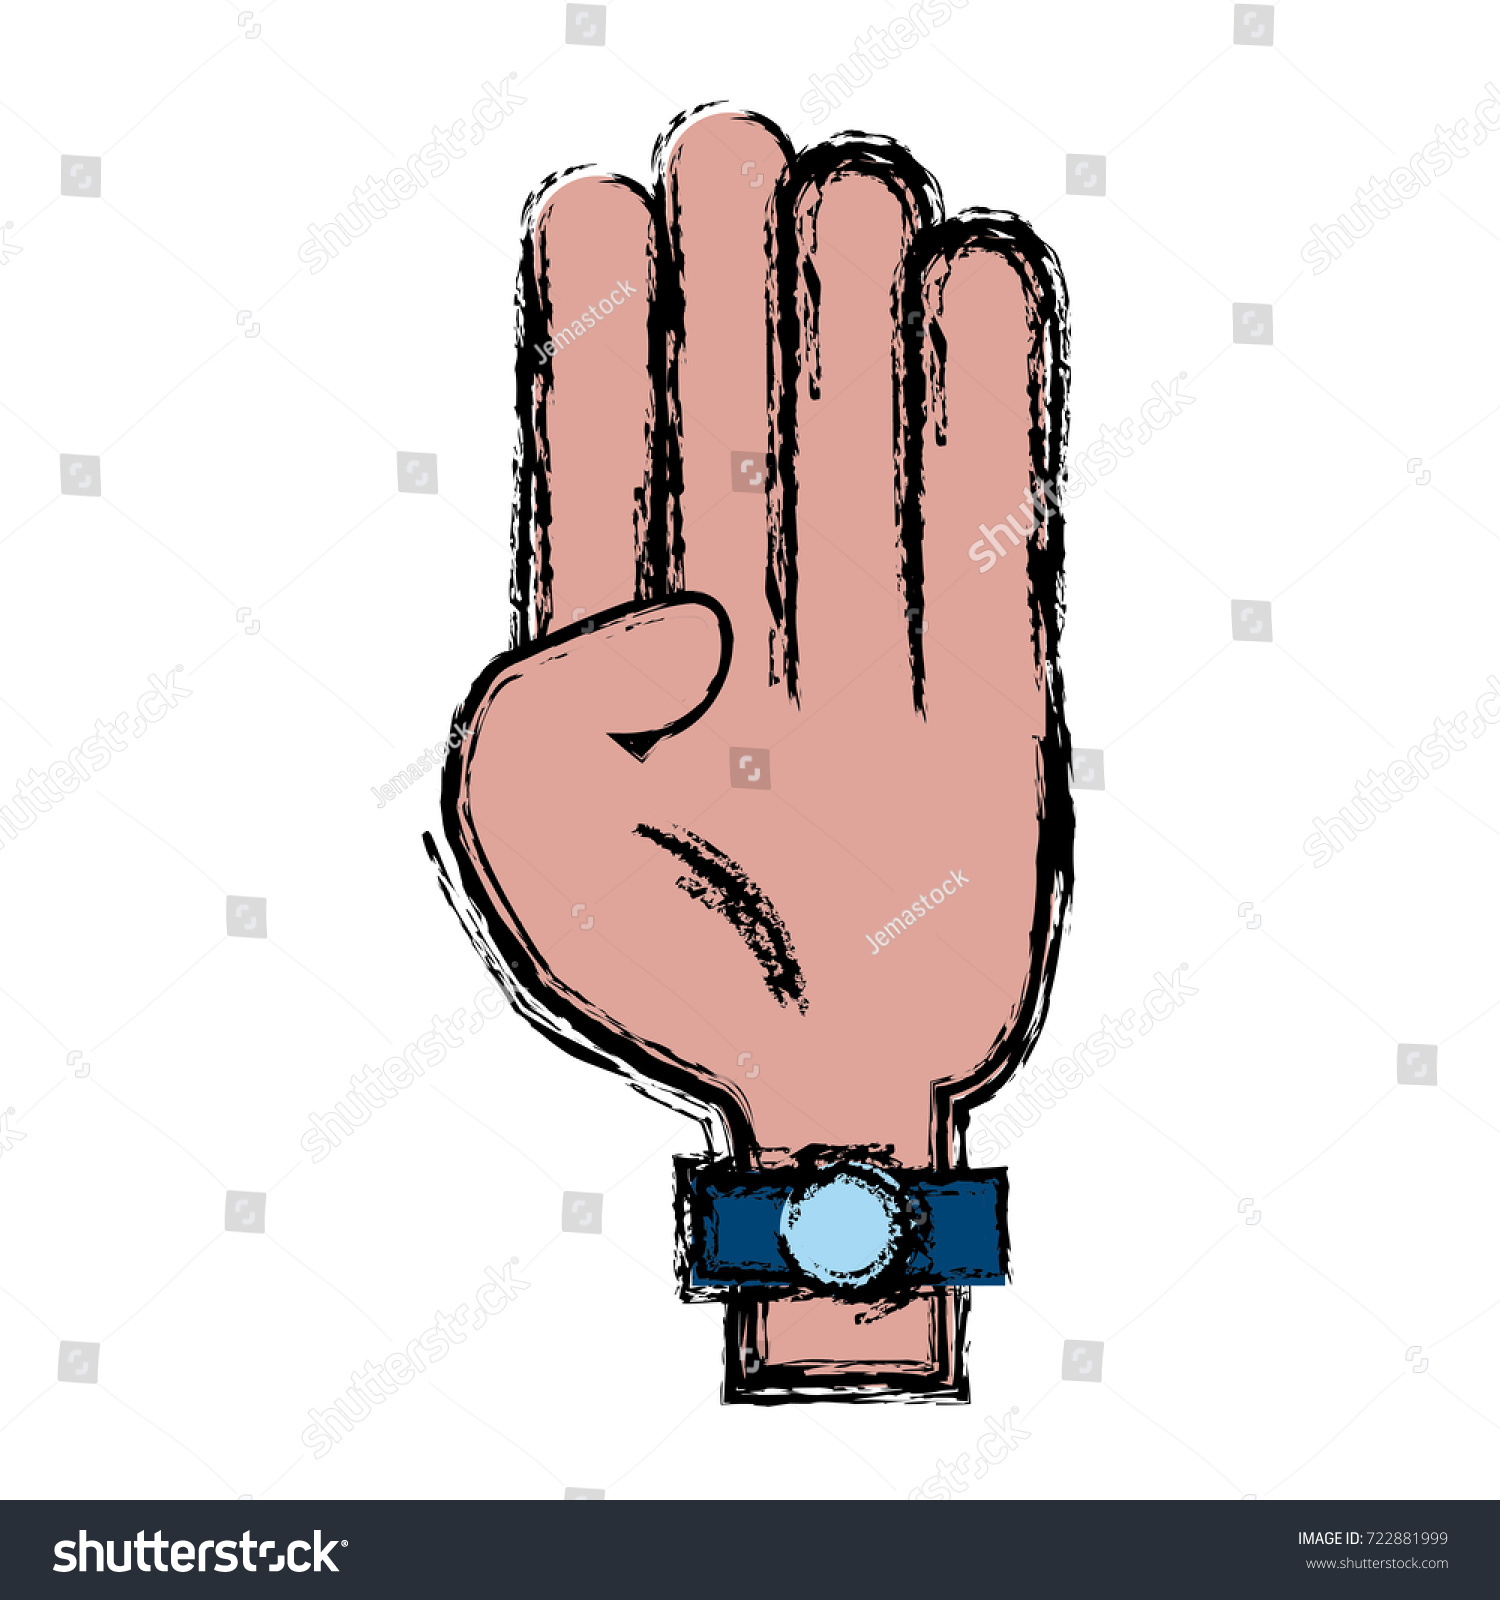 Hand symbol isolated stock vector 722881999 shutterstock hand symbol isolated biocorpaavc